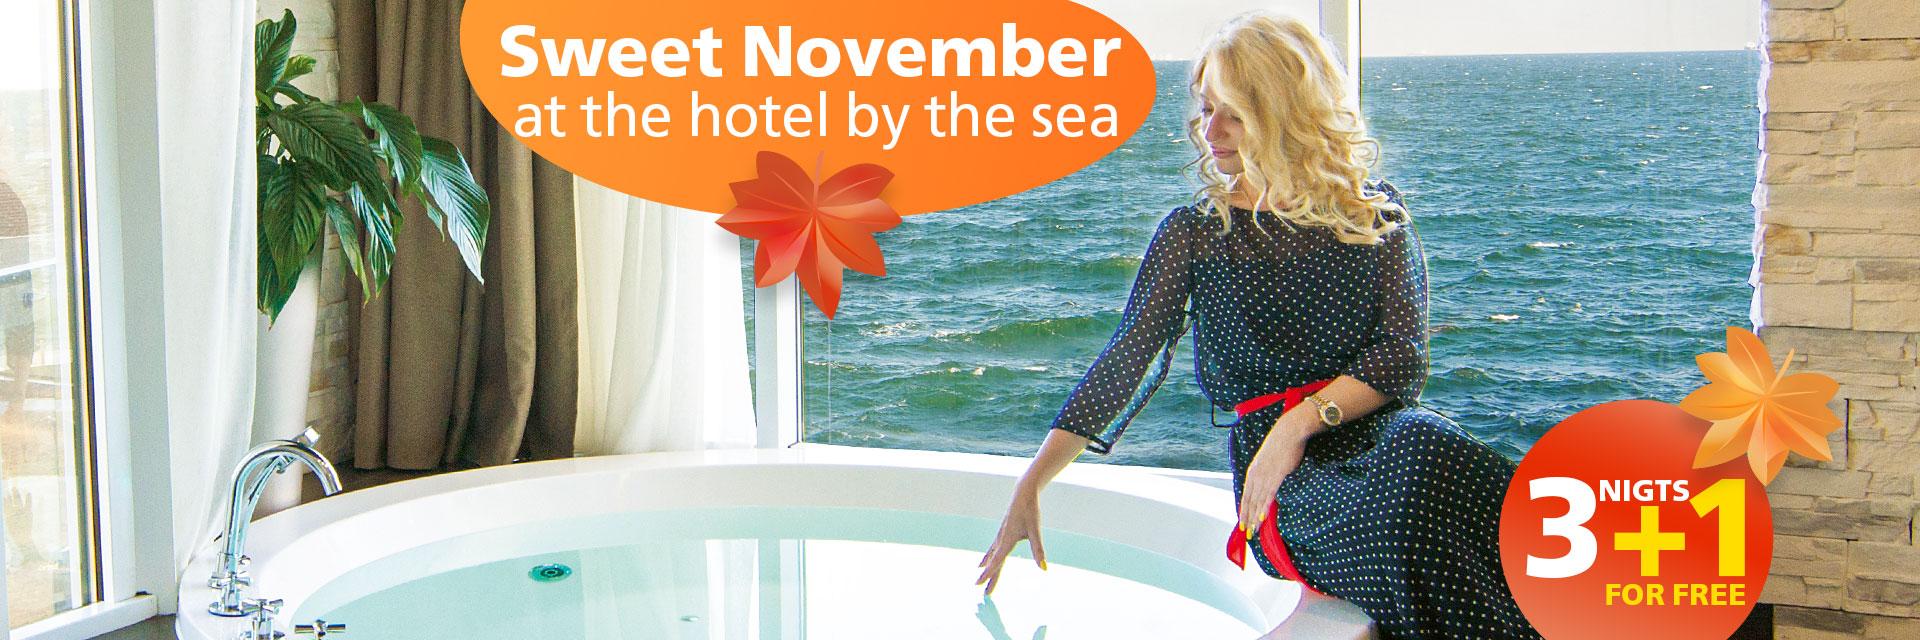 Meet sweet November at NEMO! in RESORT & SPA HOTEL NEMO, photo № 1